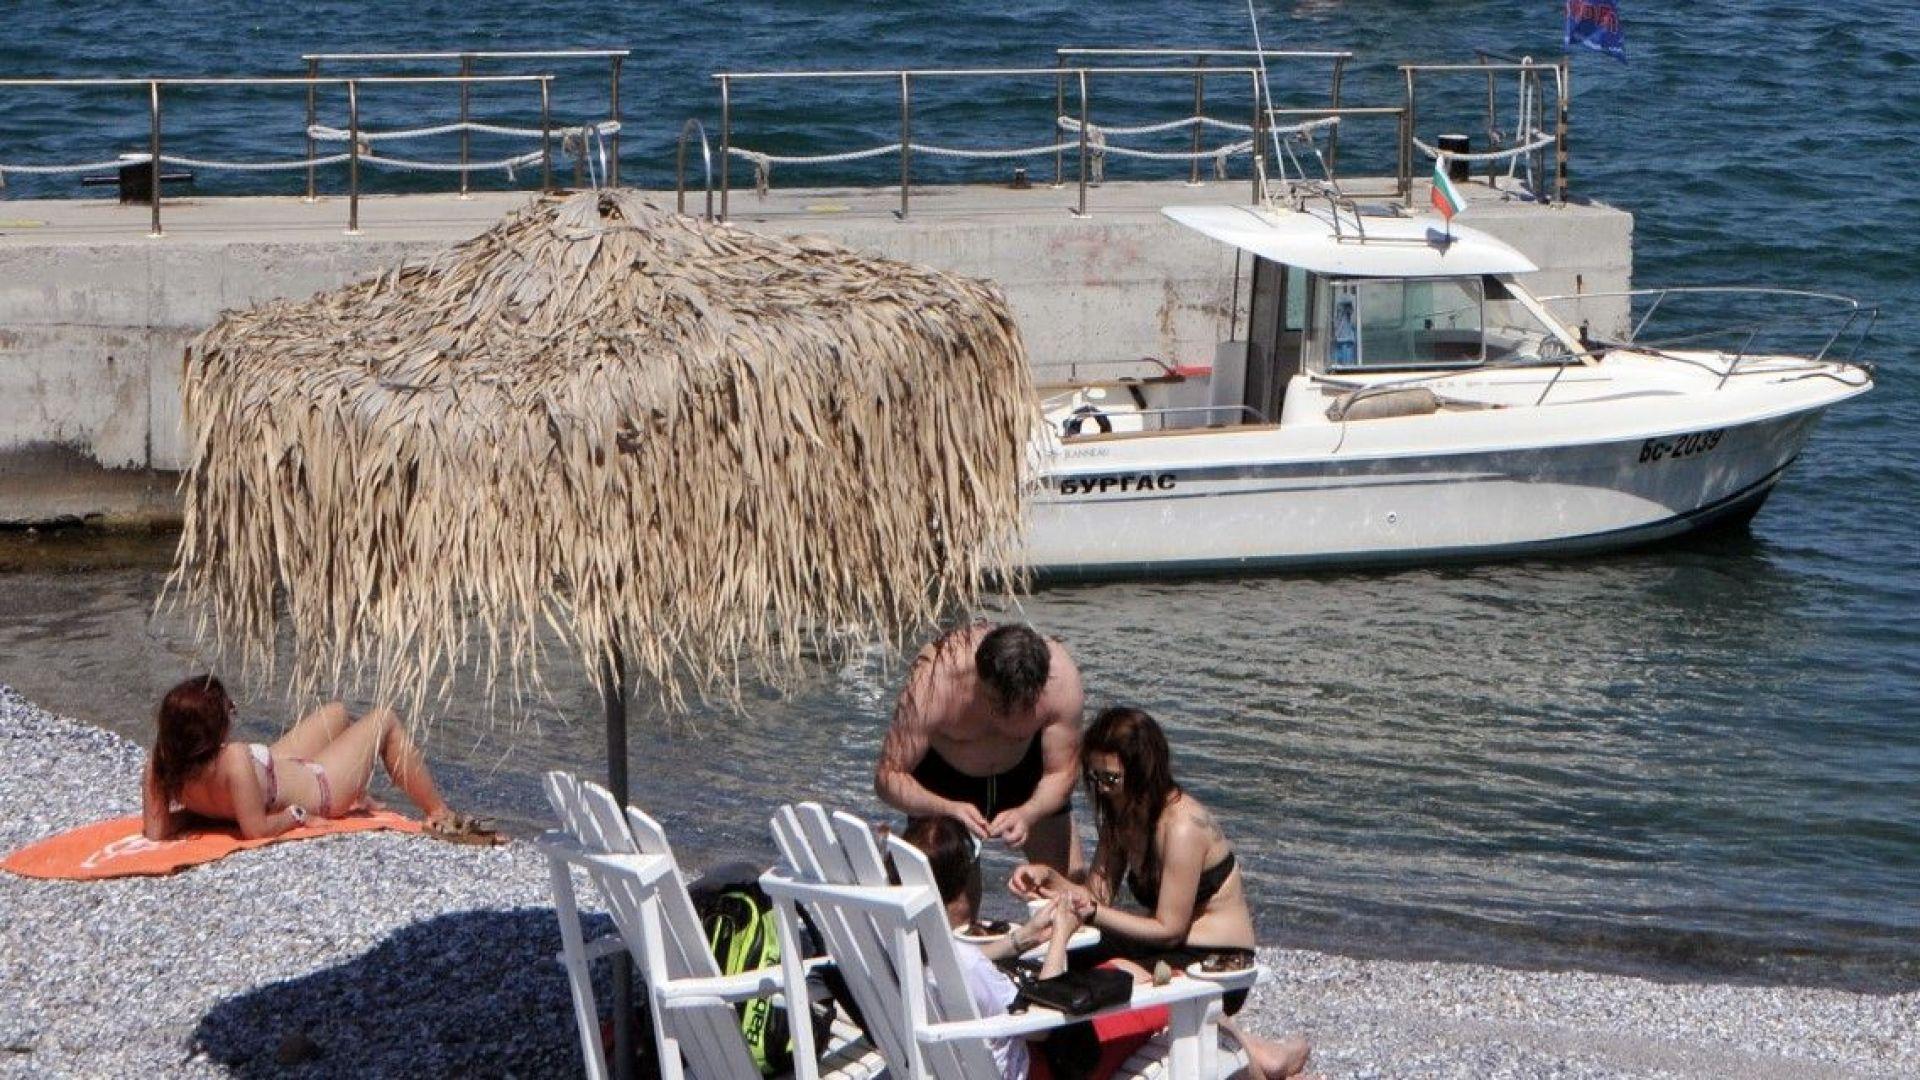 Фалстарт на туристически сезон у нас: ще пристигнат ли чаканите групи